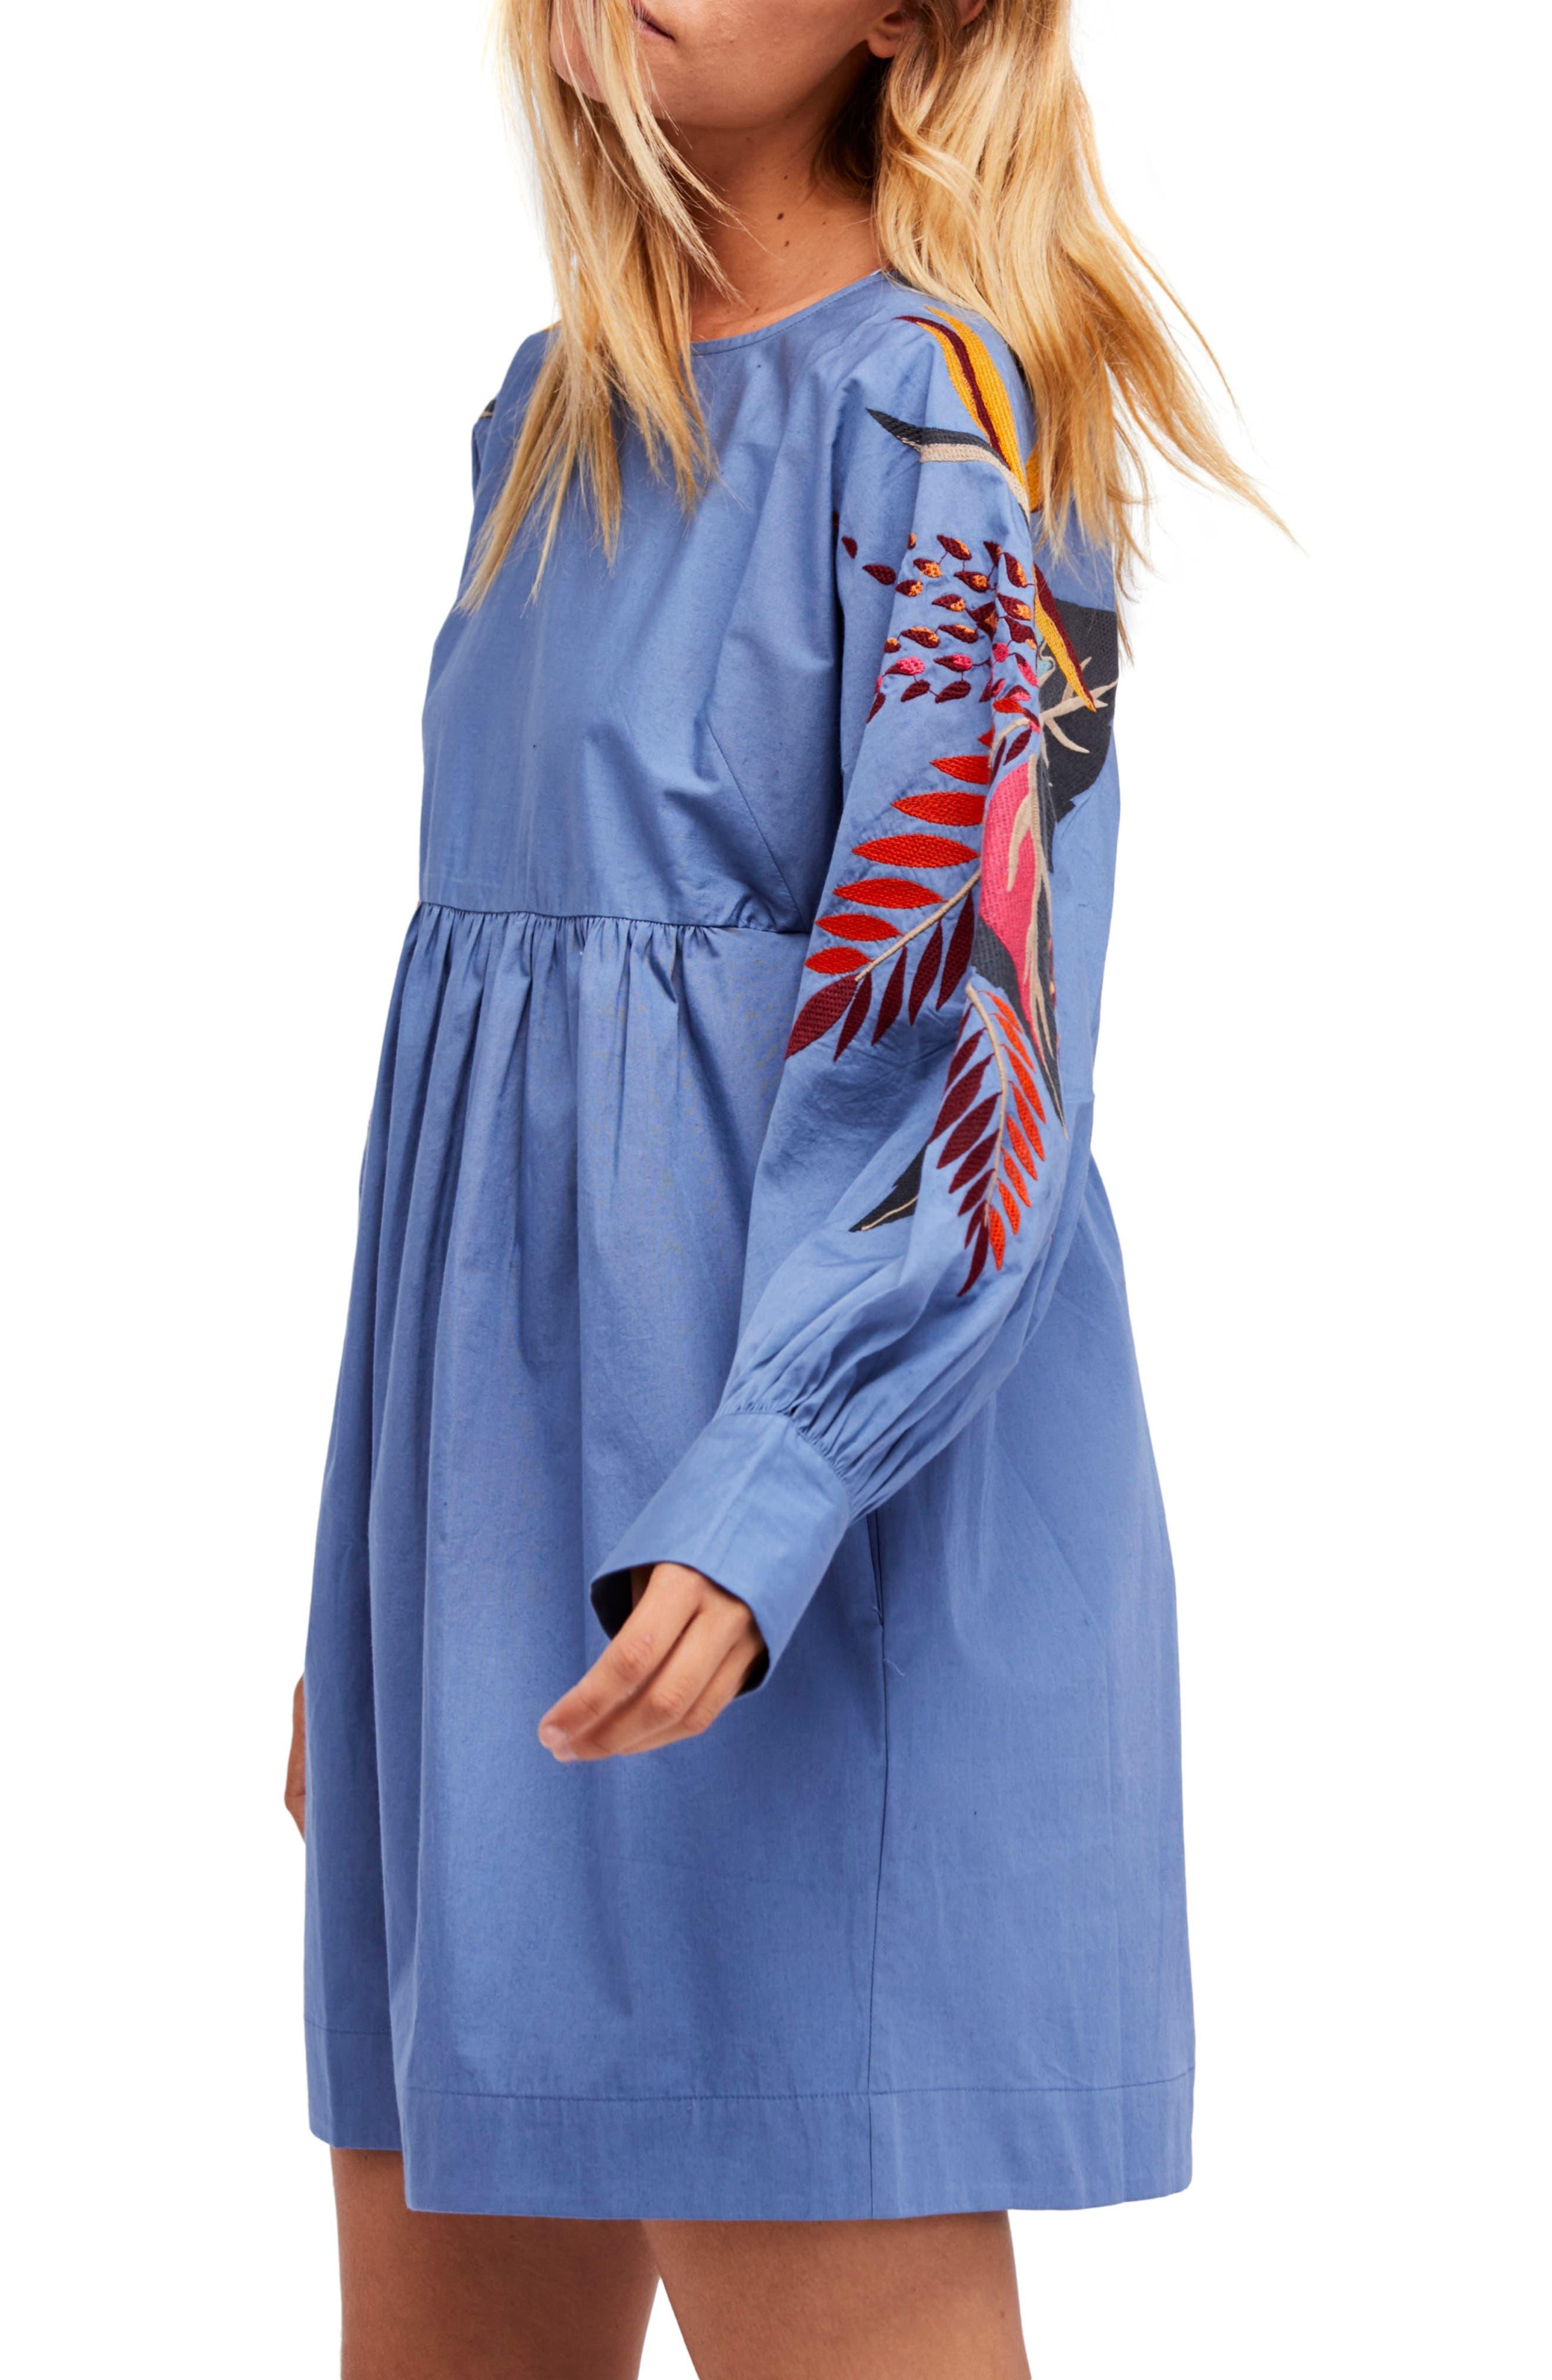 Mini Obsessions Minidress,                         Main,                         color, Blue Combo